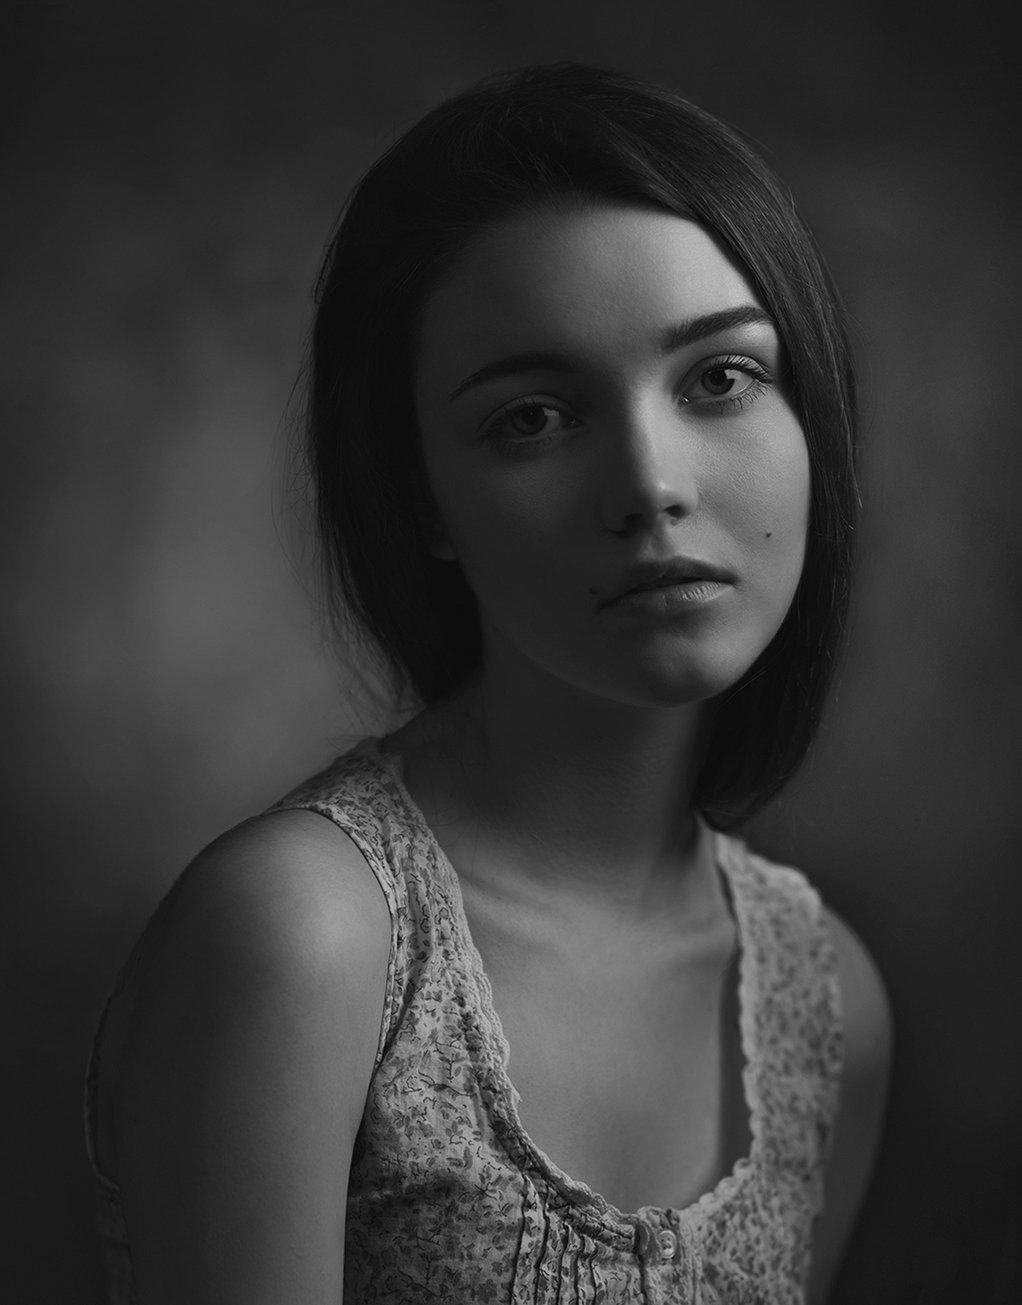 девушка, портрет, студия, свет, тень, взгляд, Александр Жосан